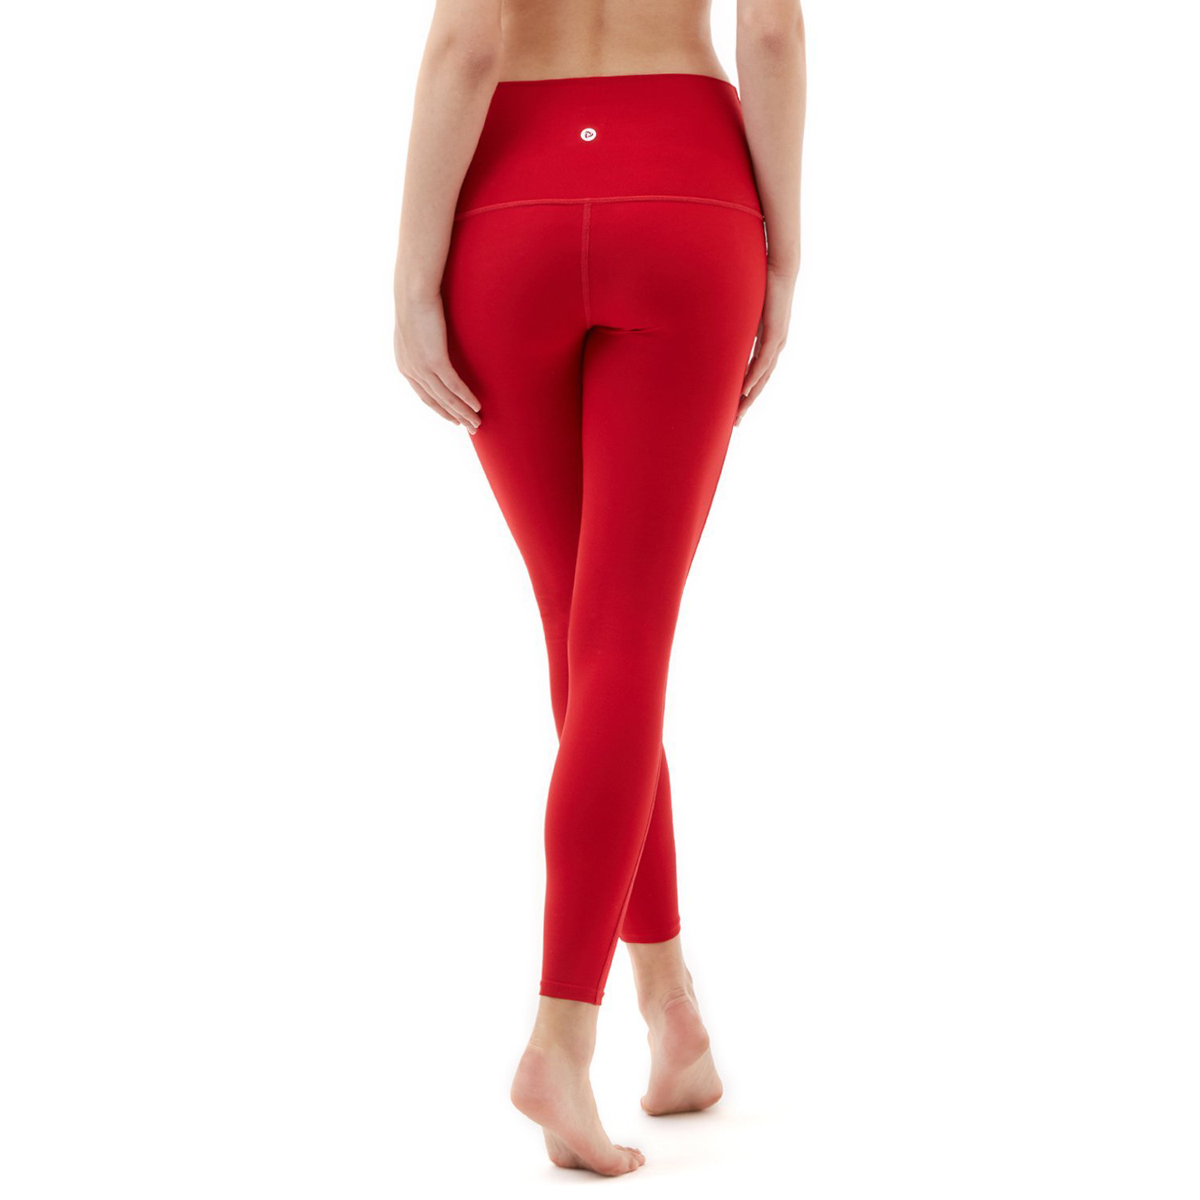 thumbnail 66 - TSLA Tesla FYP42 Women's High-Waisted Ultra-Stretch Tummy Control Yoga Pants